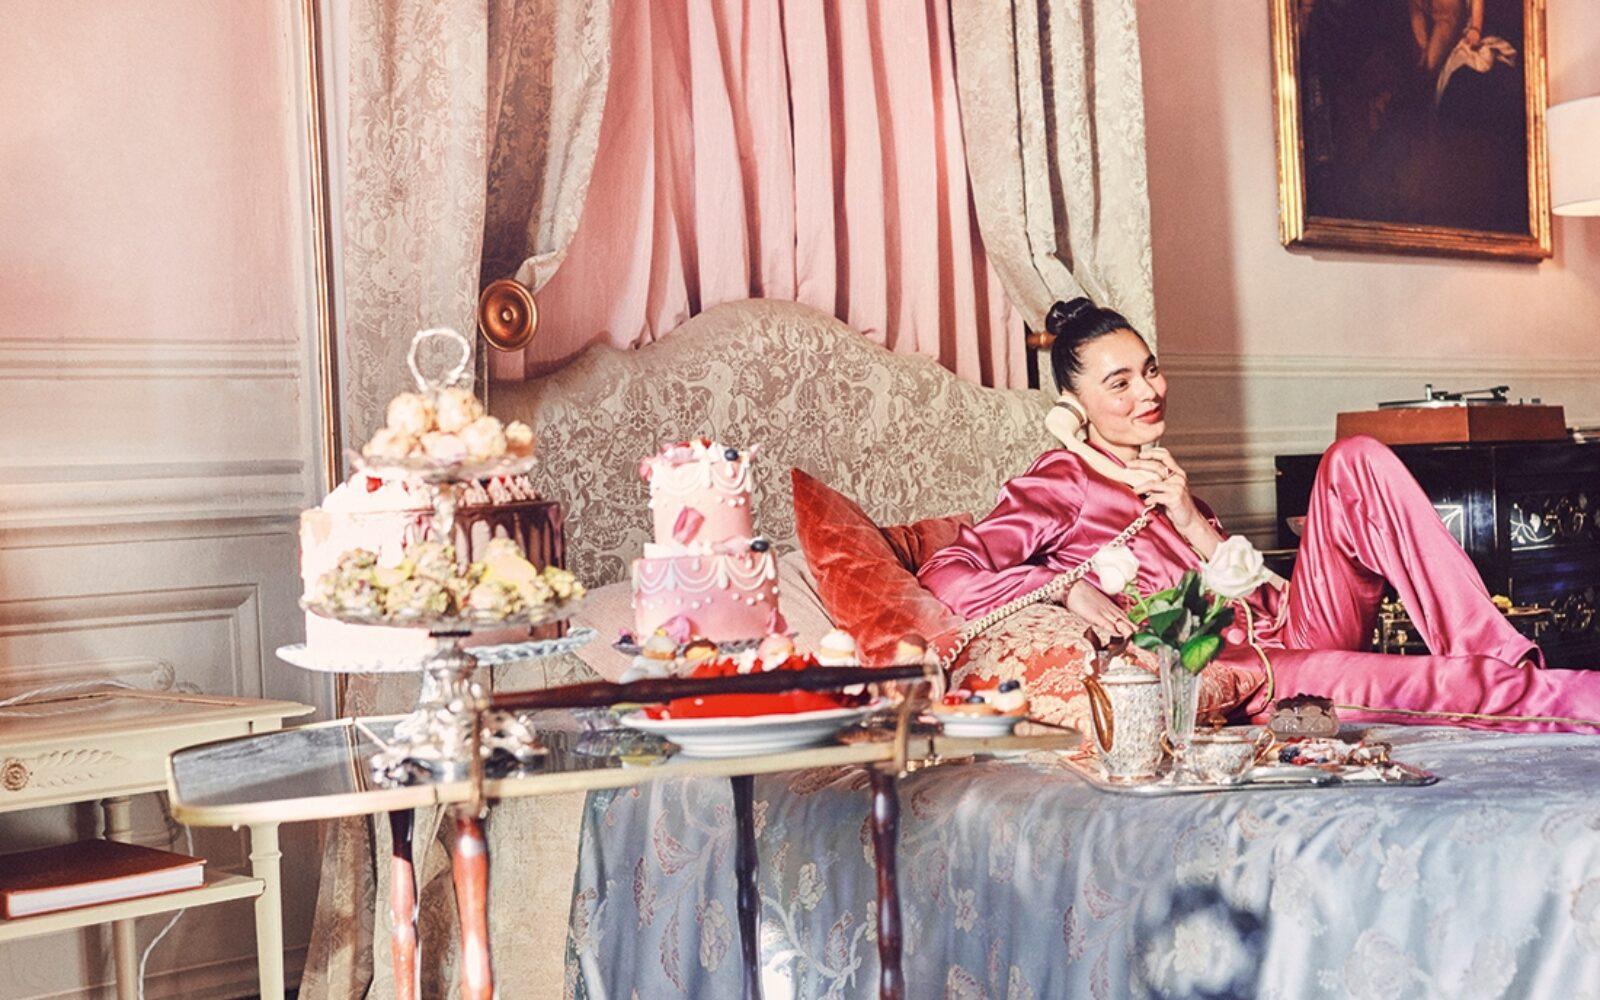 Bvlgari has unveiled Allegra, it's latest perfume collection